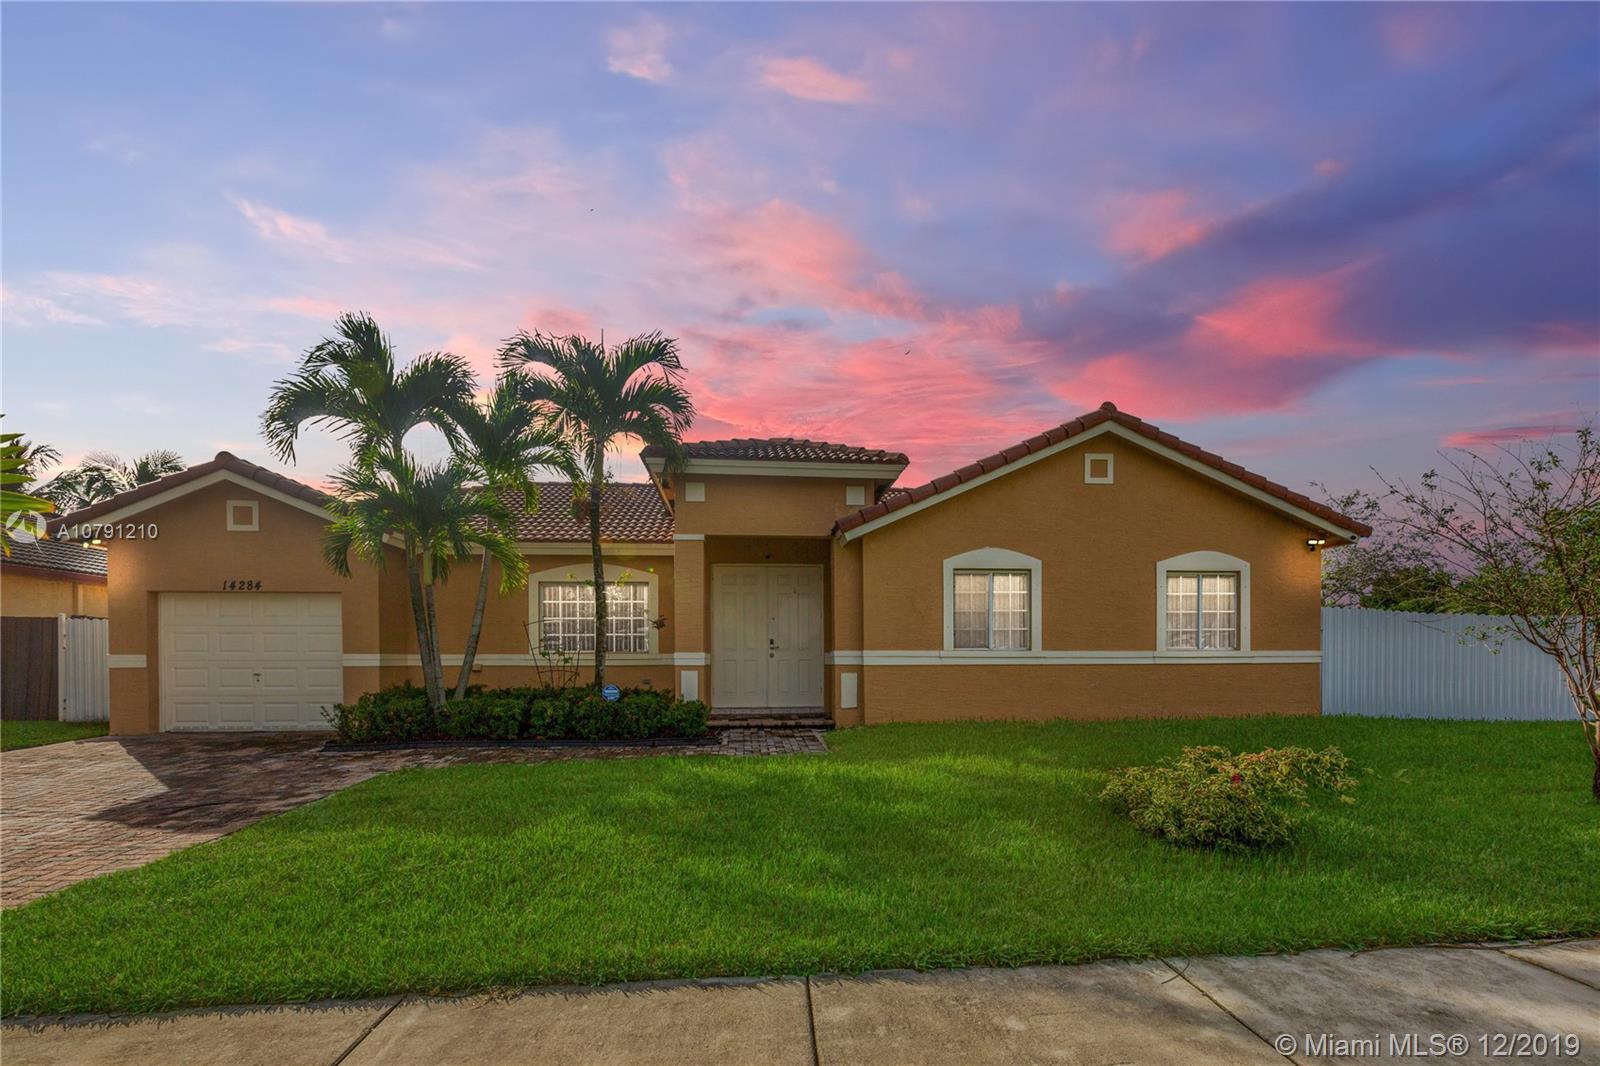 14284 SW 293rd Ter, Homestead, FL 33033 - Homestead, FL real estate listing